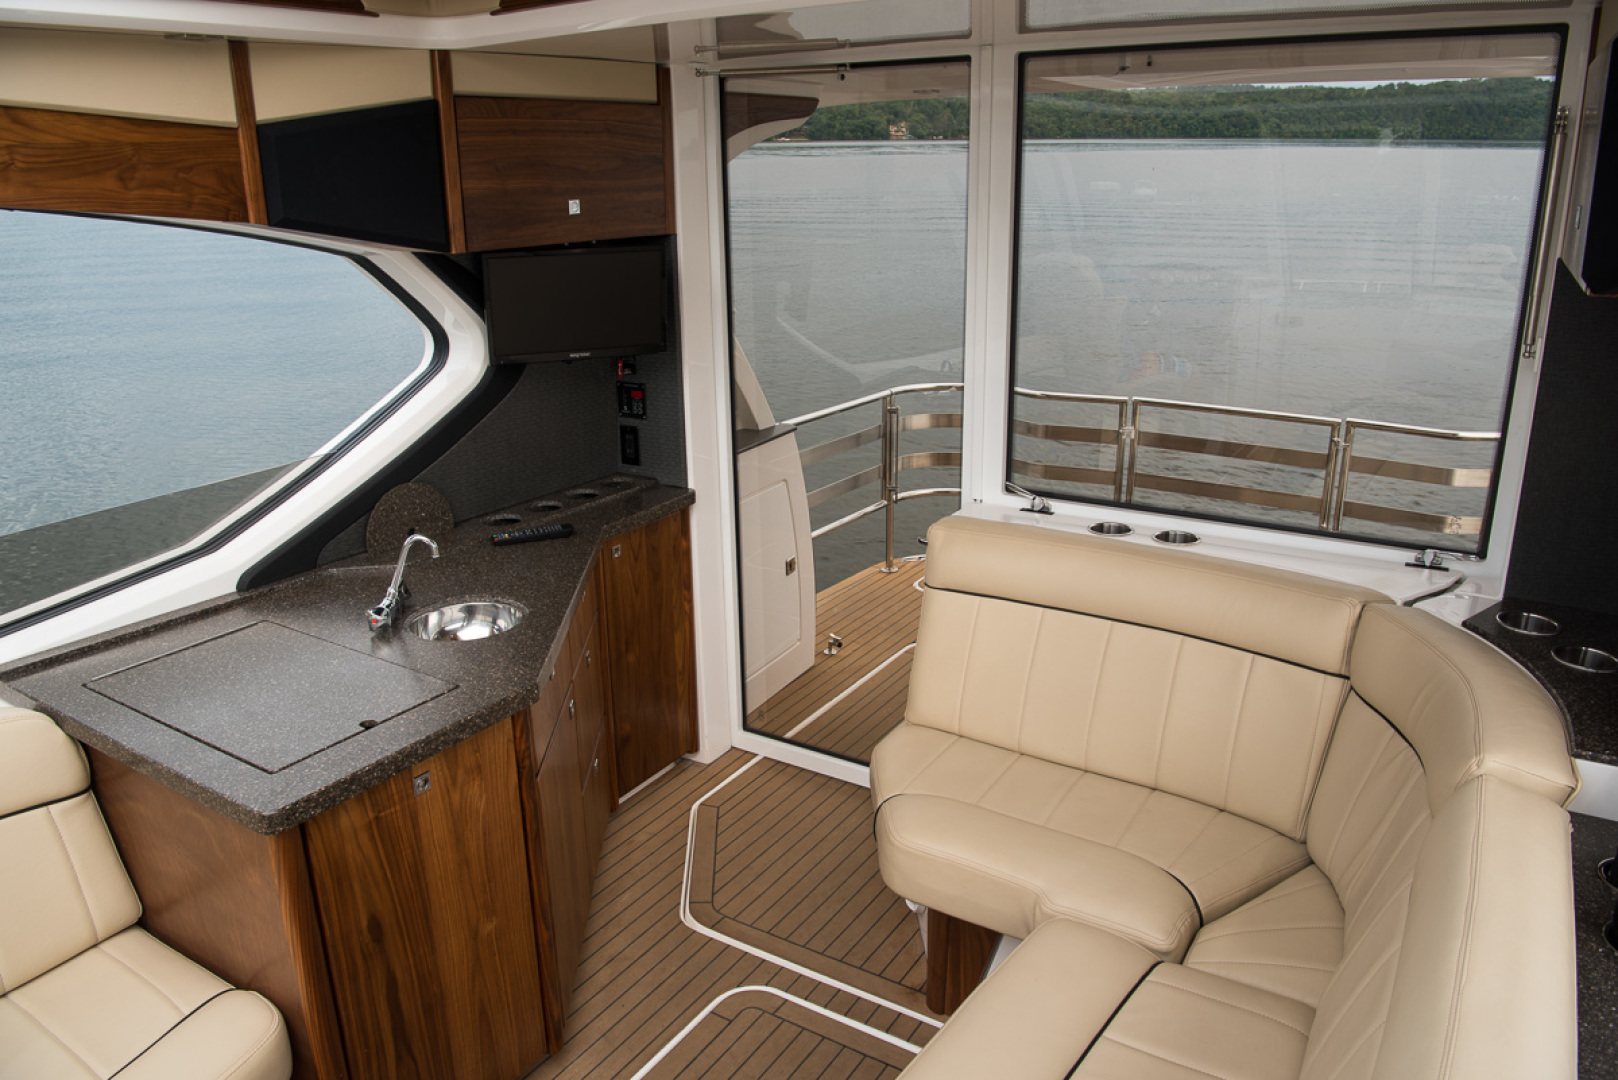 Floe Craft-Afina 3950 2019 -St Petersburg-Florida-United States-Cockpit-1279584   Thumbnail